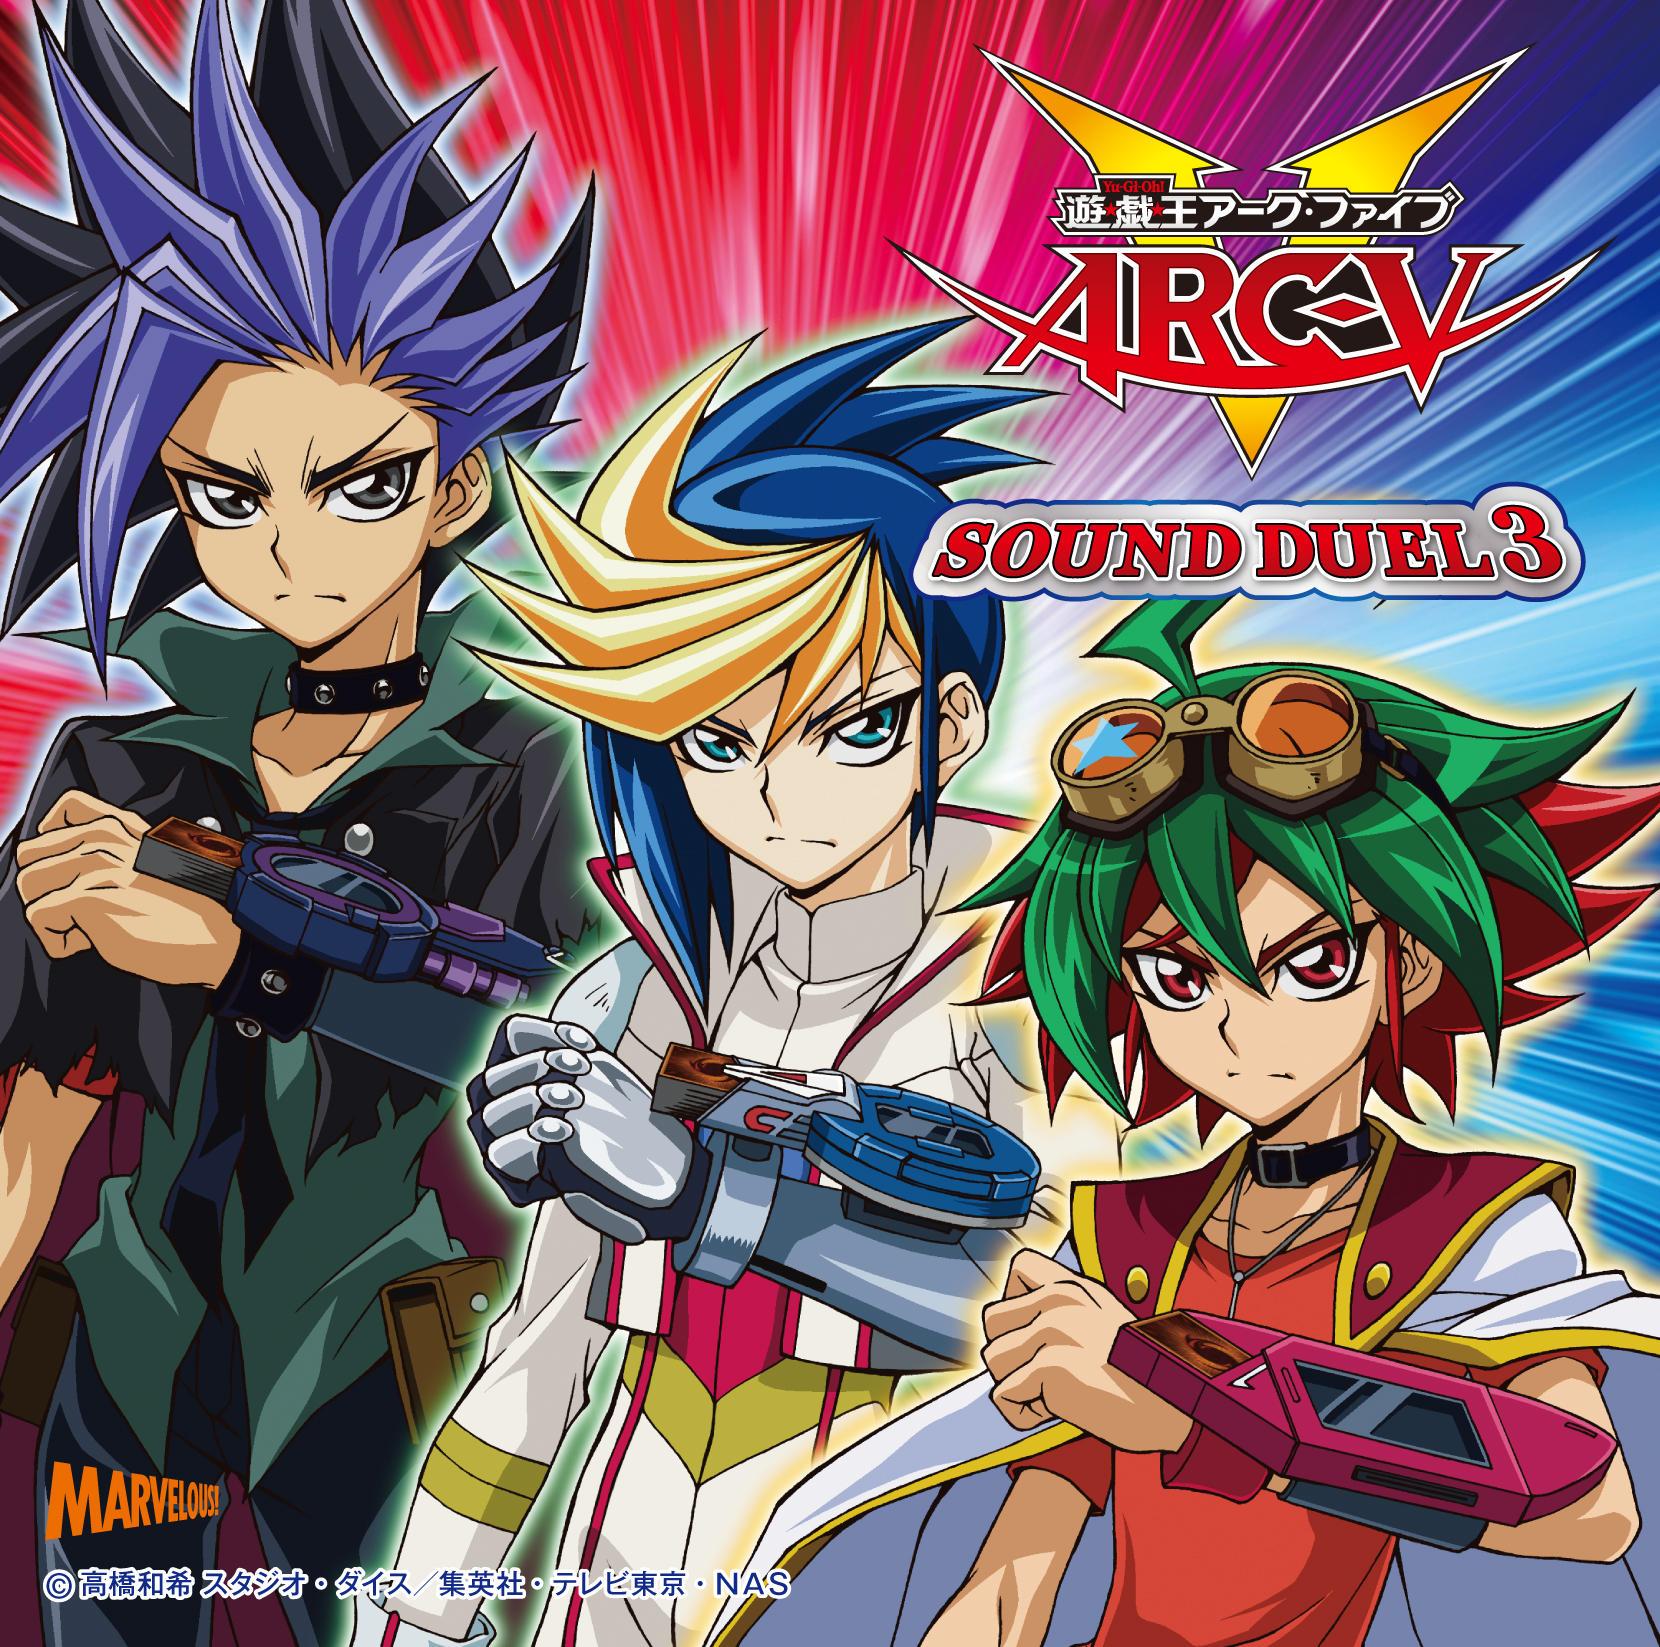 Yu-Gi-Oh! ARC-V Sound Duel 3